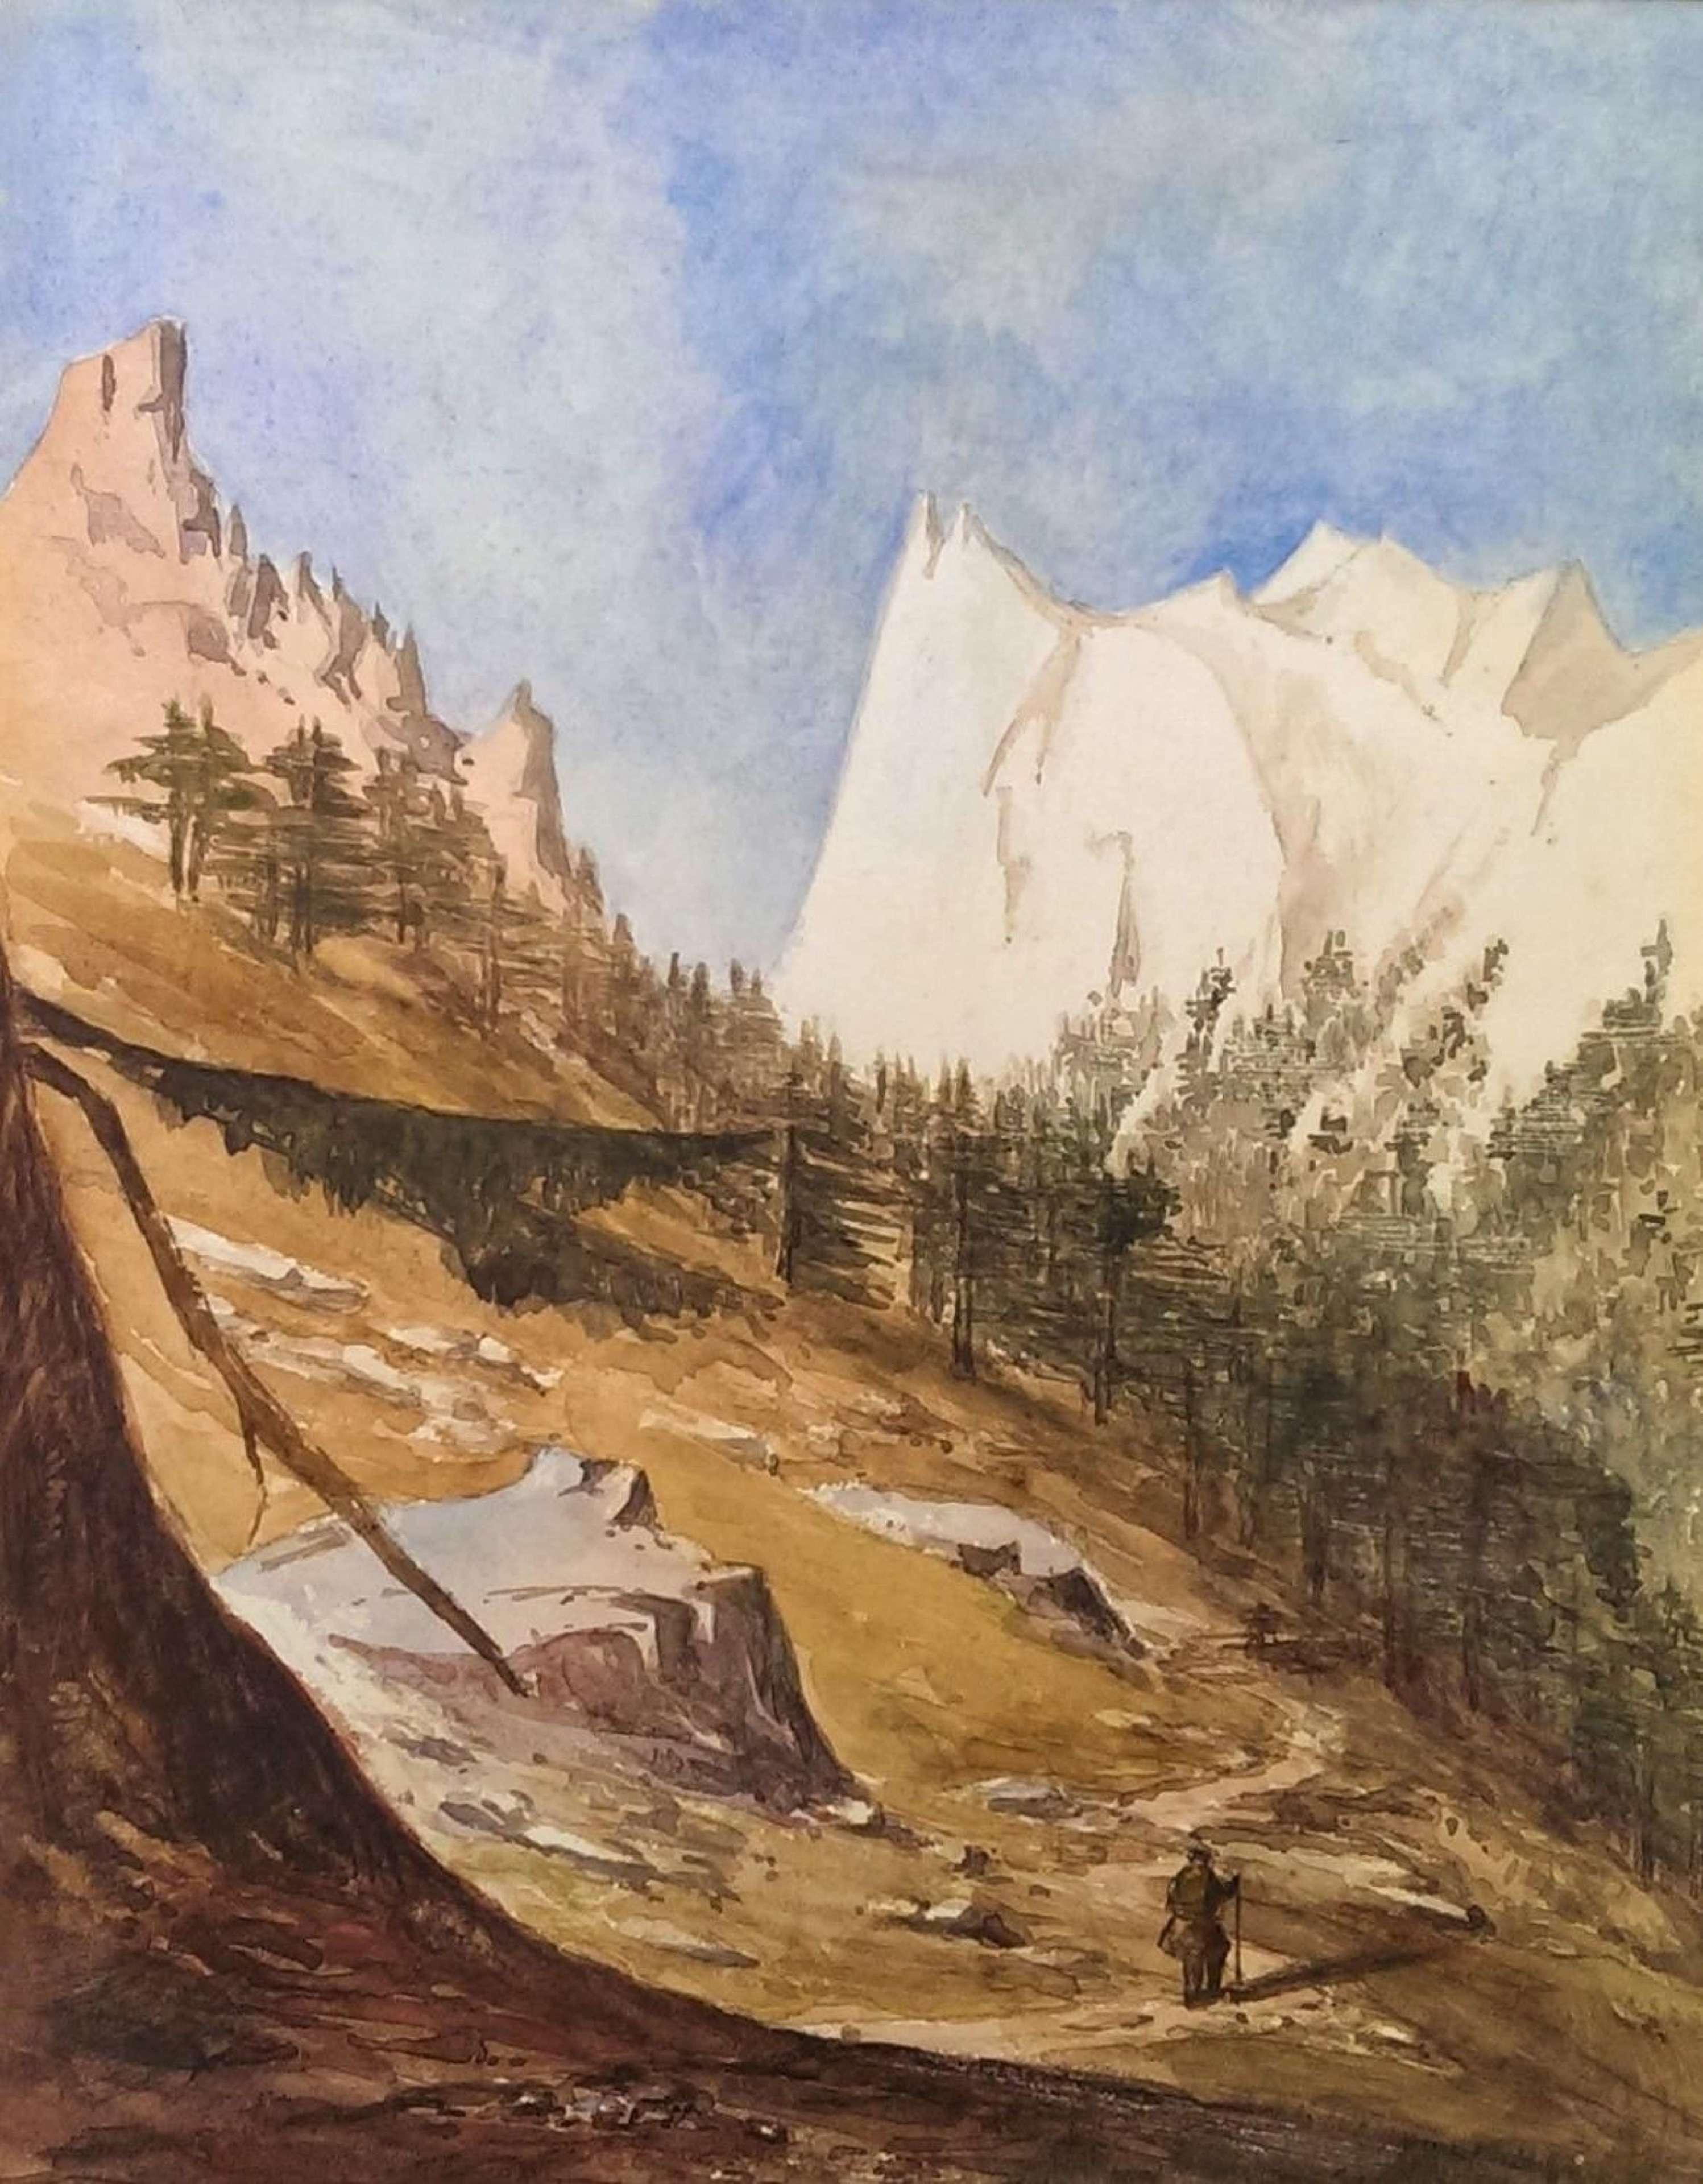 View of Gungootrie [Gangotri] Peak, Indian Himalayas, 1852